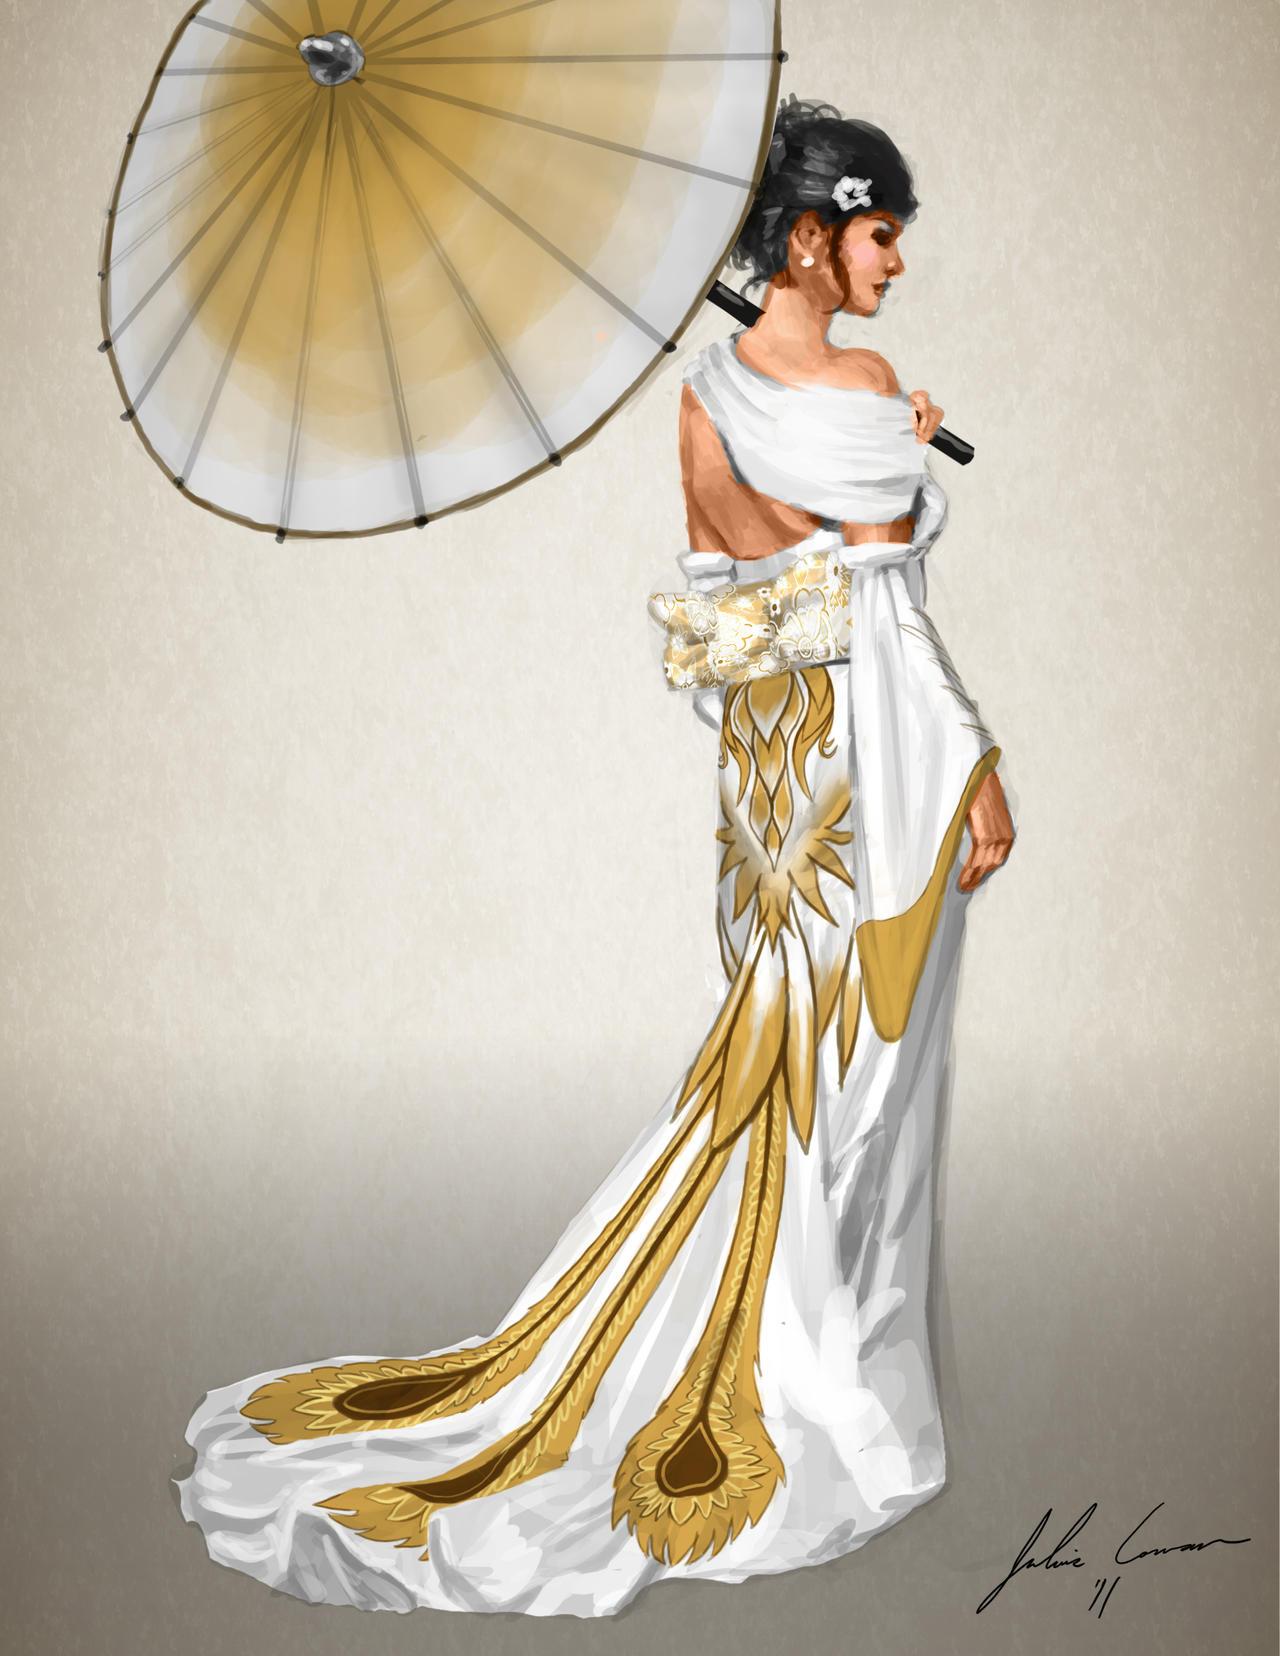 Wedding Gown Design Back By Jecbrush On Deviantart